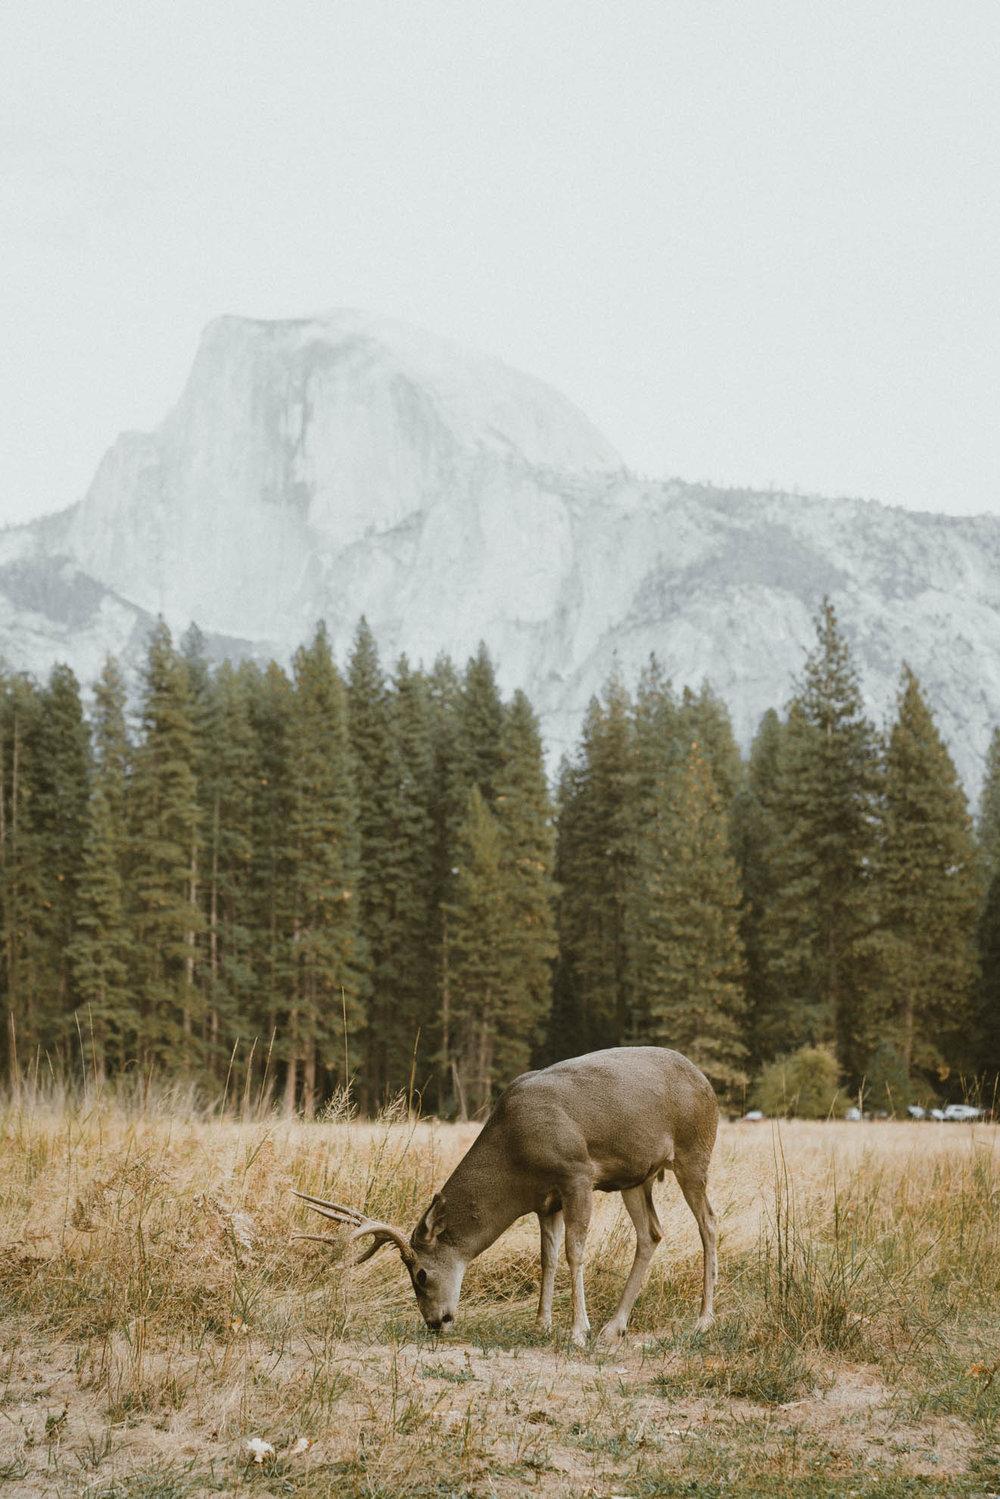 Deer in the meadow at Yosemite National Park